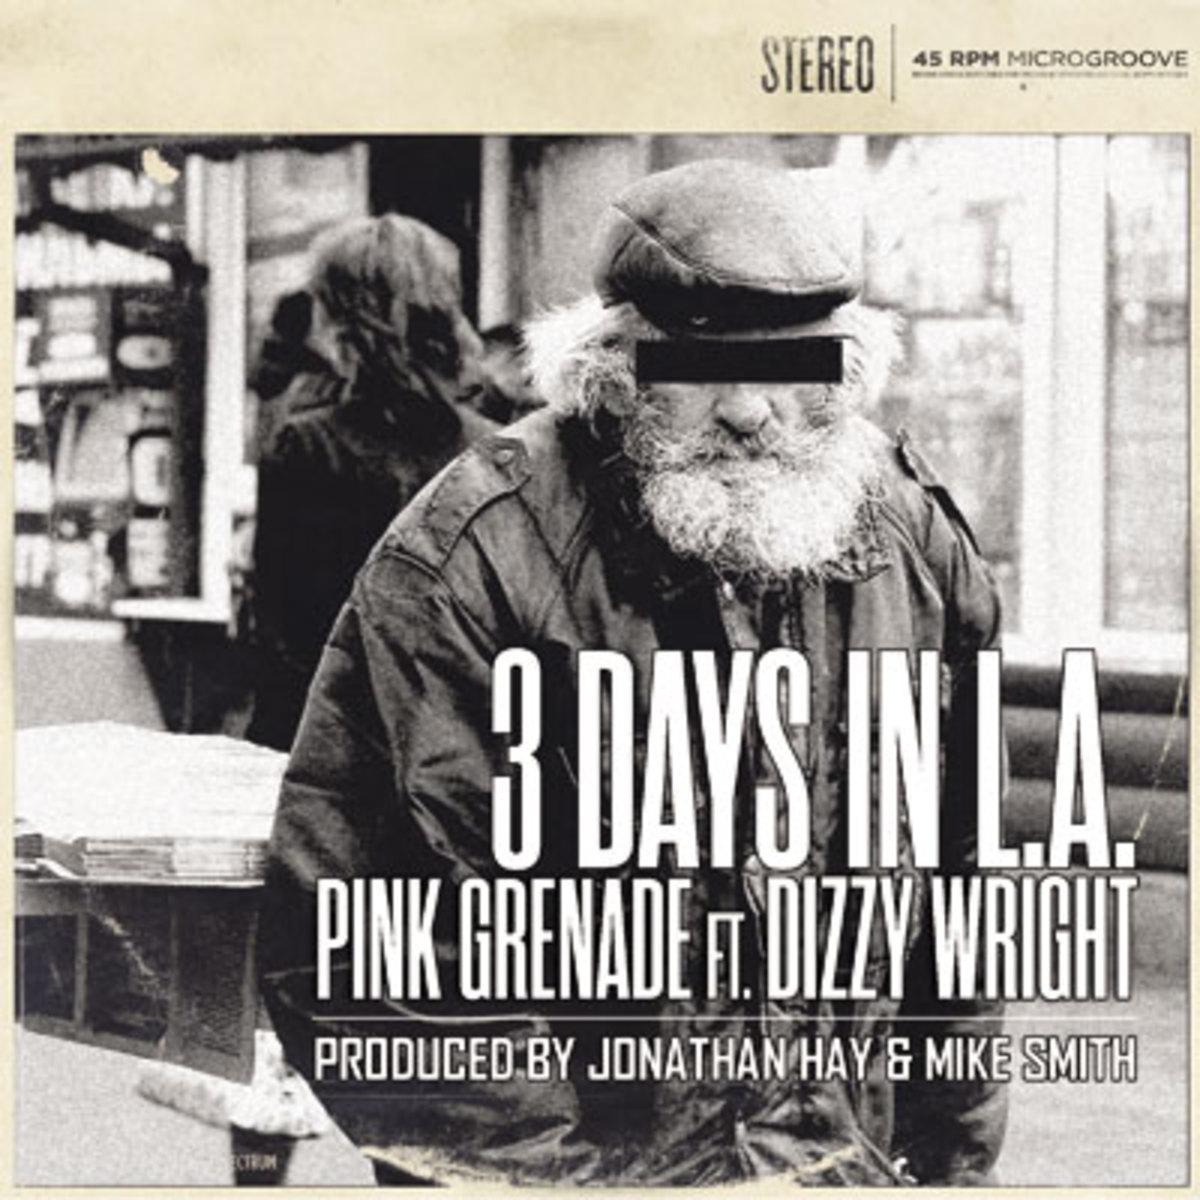 pinkgrenade-3daysinla.jpg